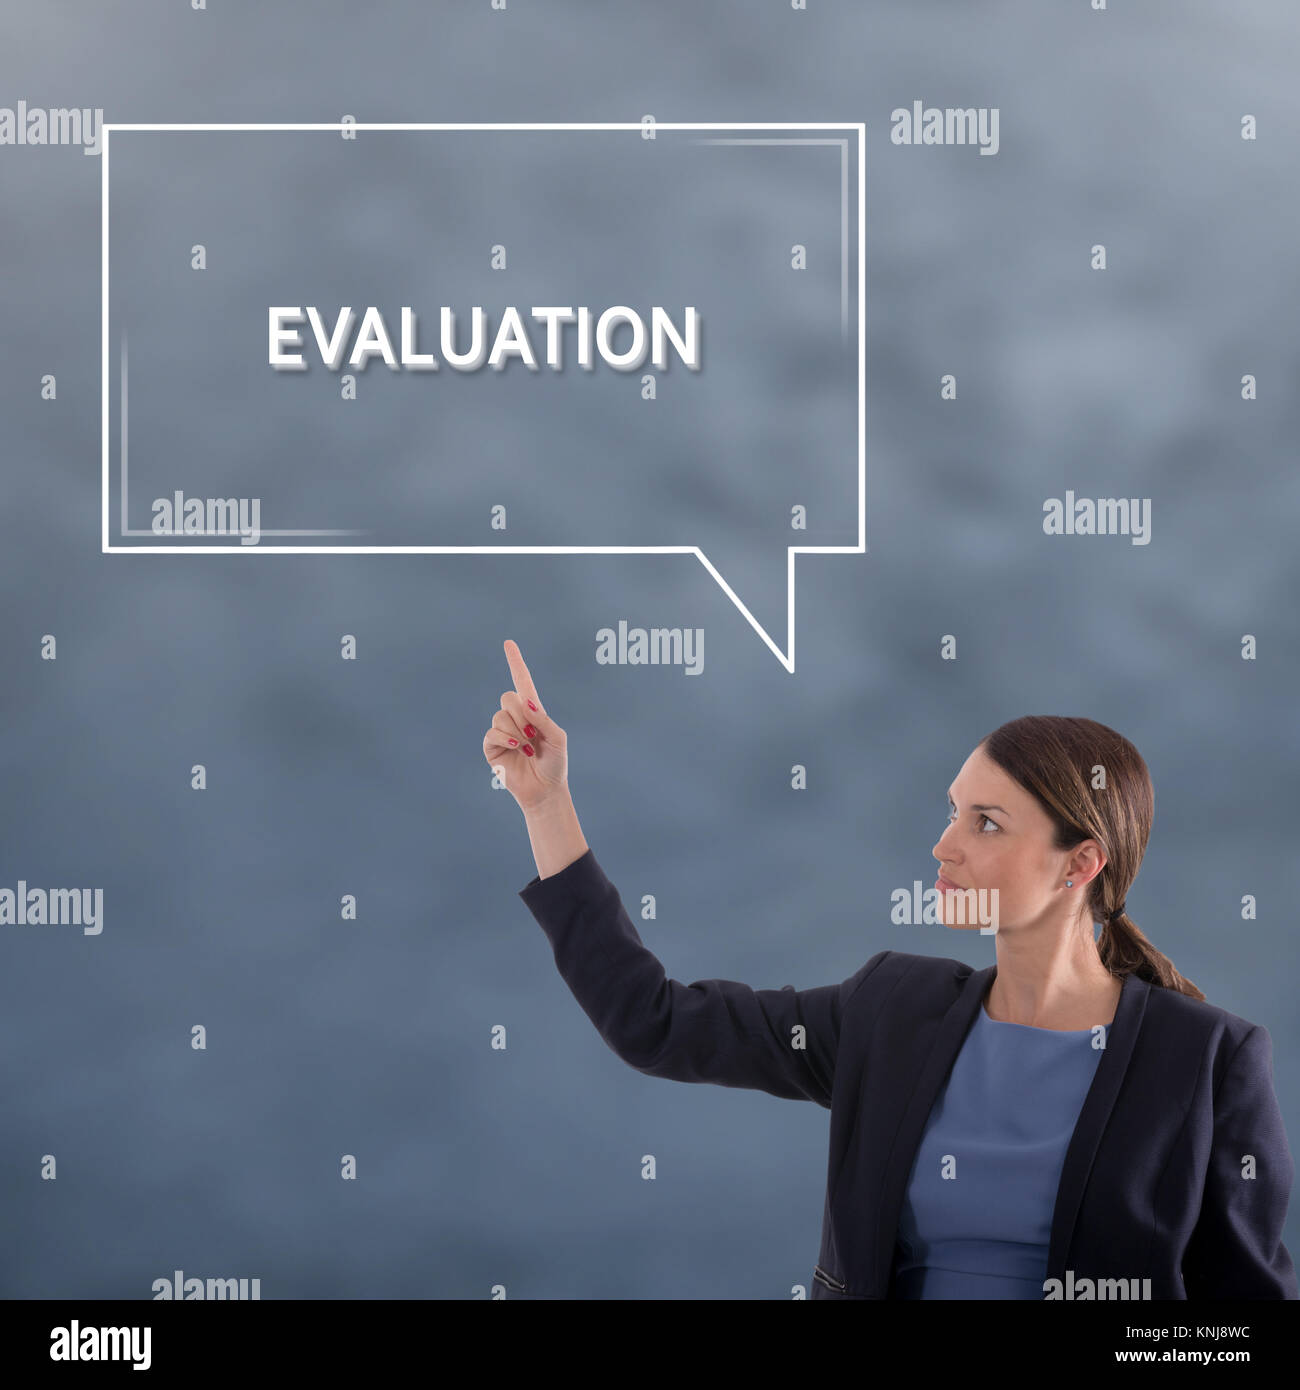 EVALUATION Business Concept. Business Woman Graphic Concept Stock Photo